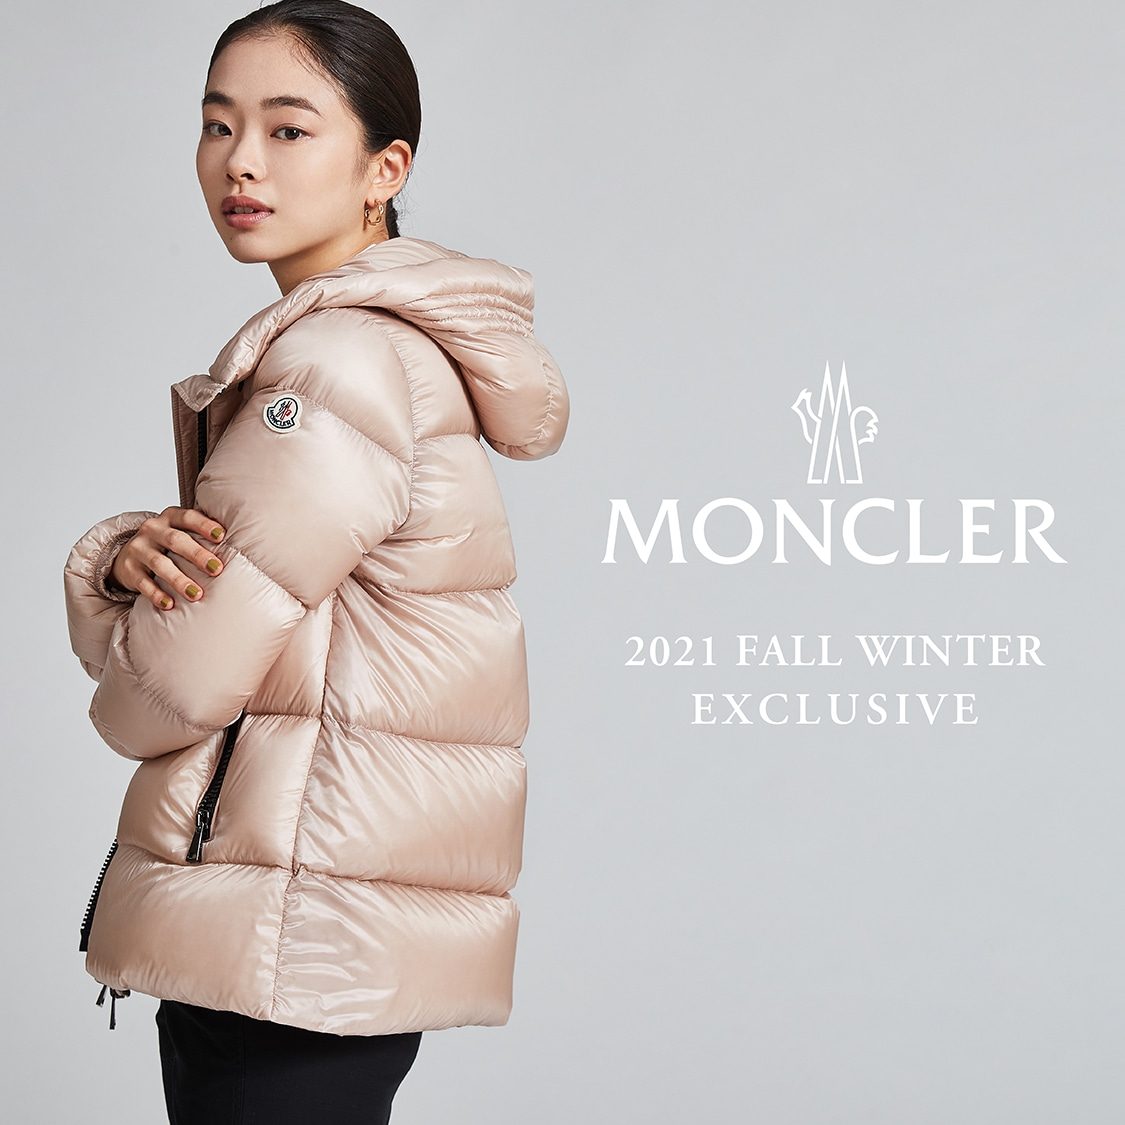 MONCLER 2021 FALL WINTER